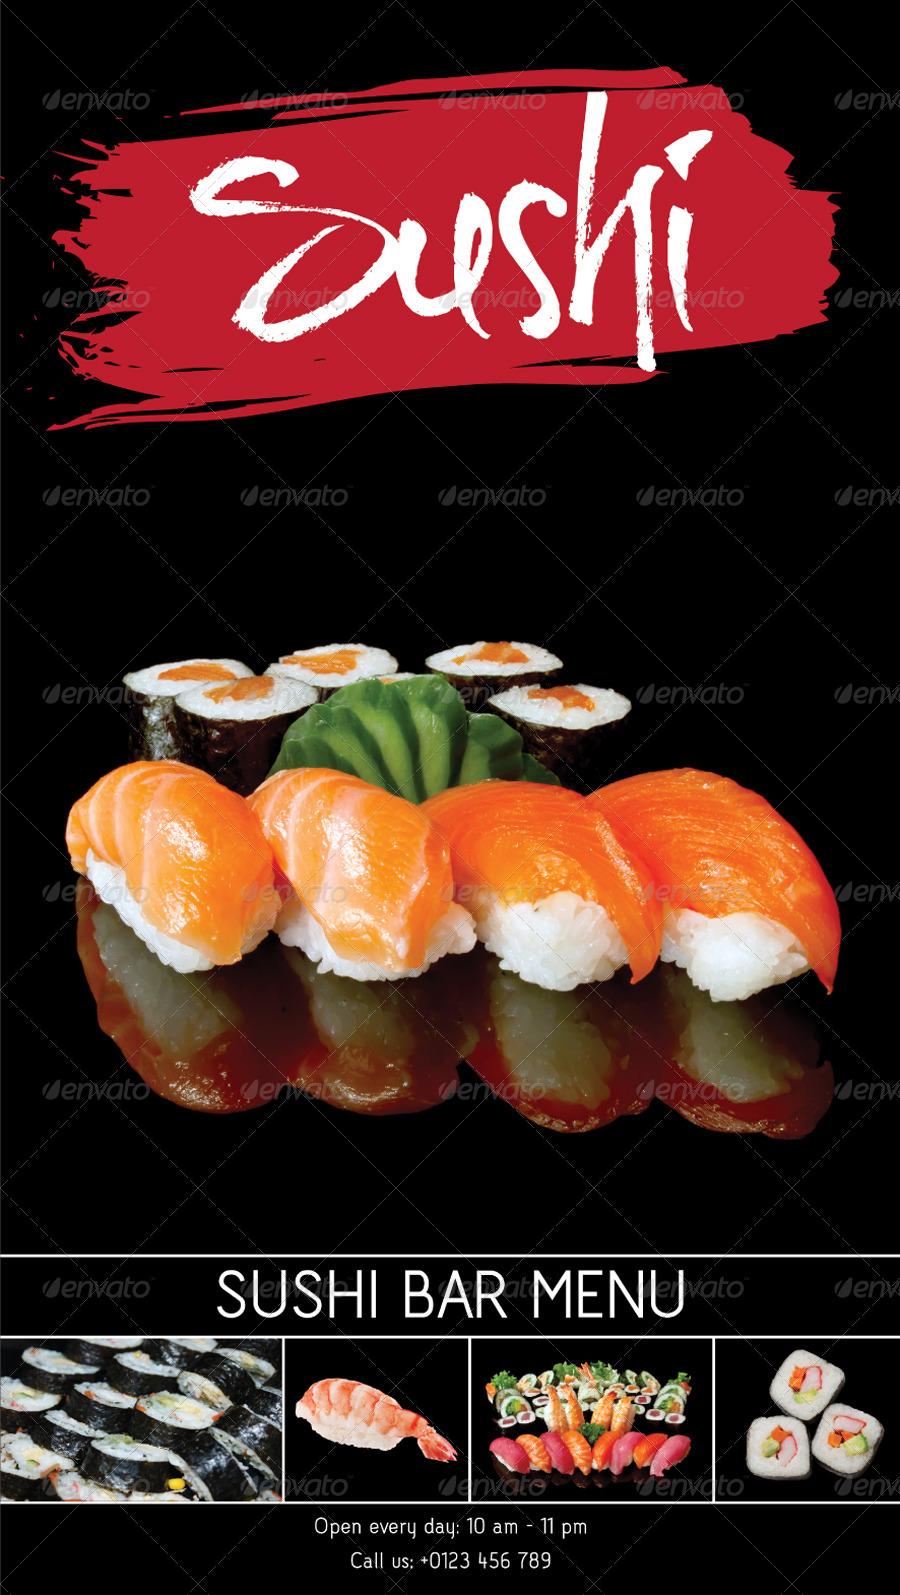 Sushi bar menu template by kukidizajn graphicriver sushi bar menu image setg pronofoot35fo Gallery